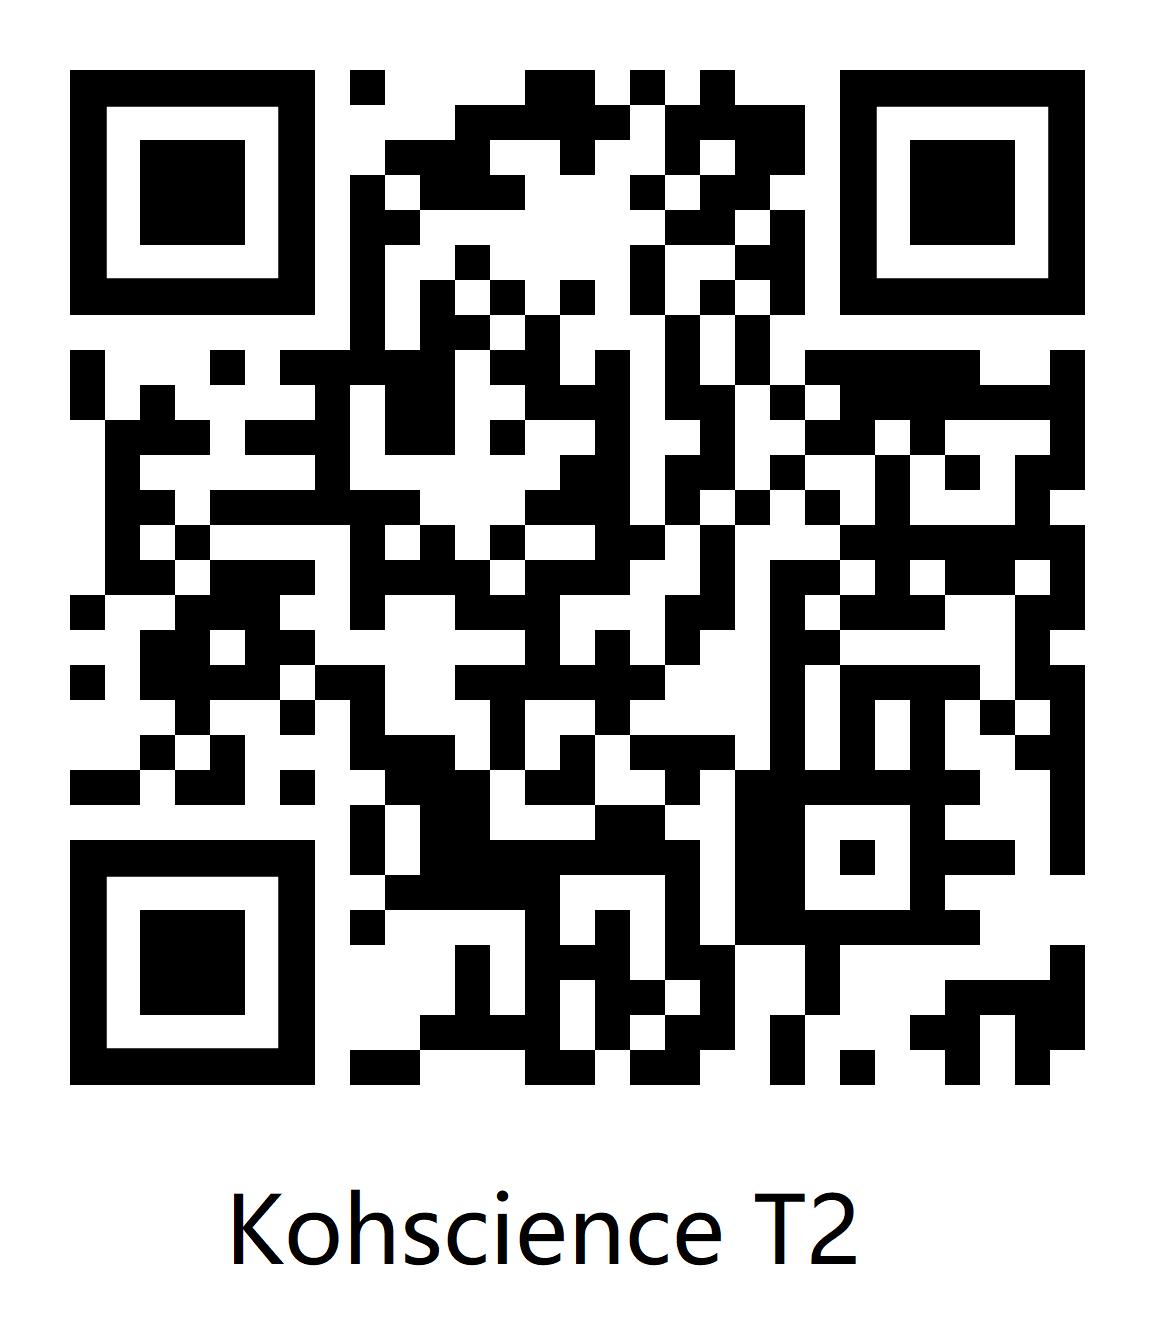 Kohscience T2 KSSM